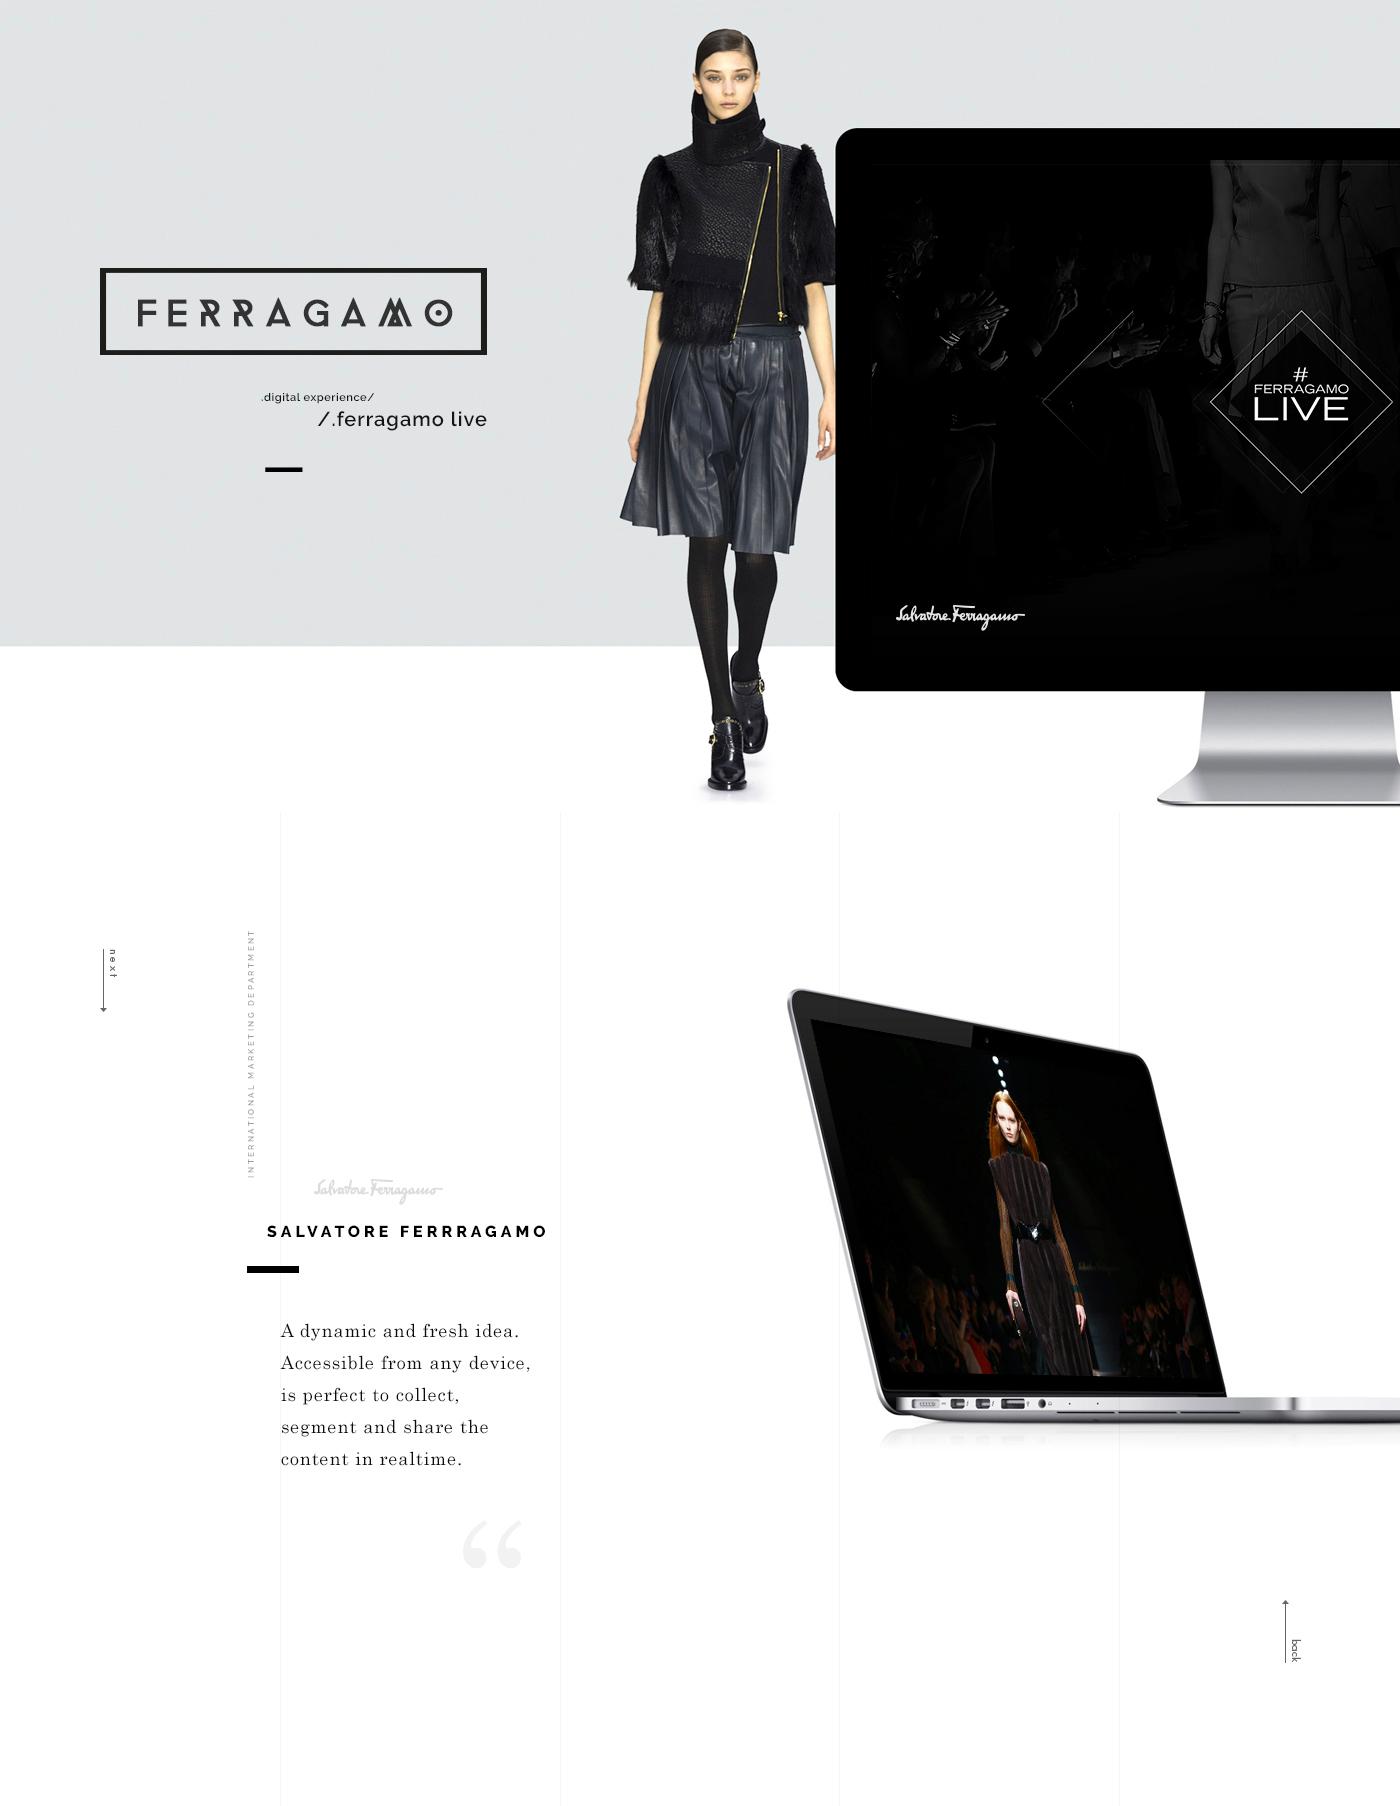 ux xD Experience design userjourney user journey Ferragamo salvatore mobile Responsive live